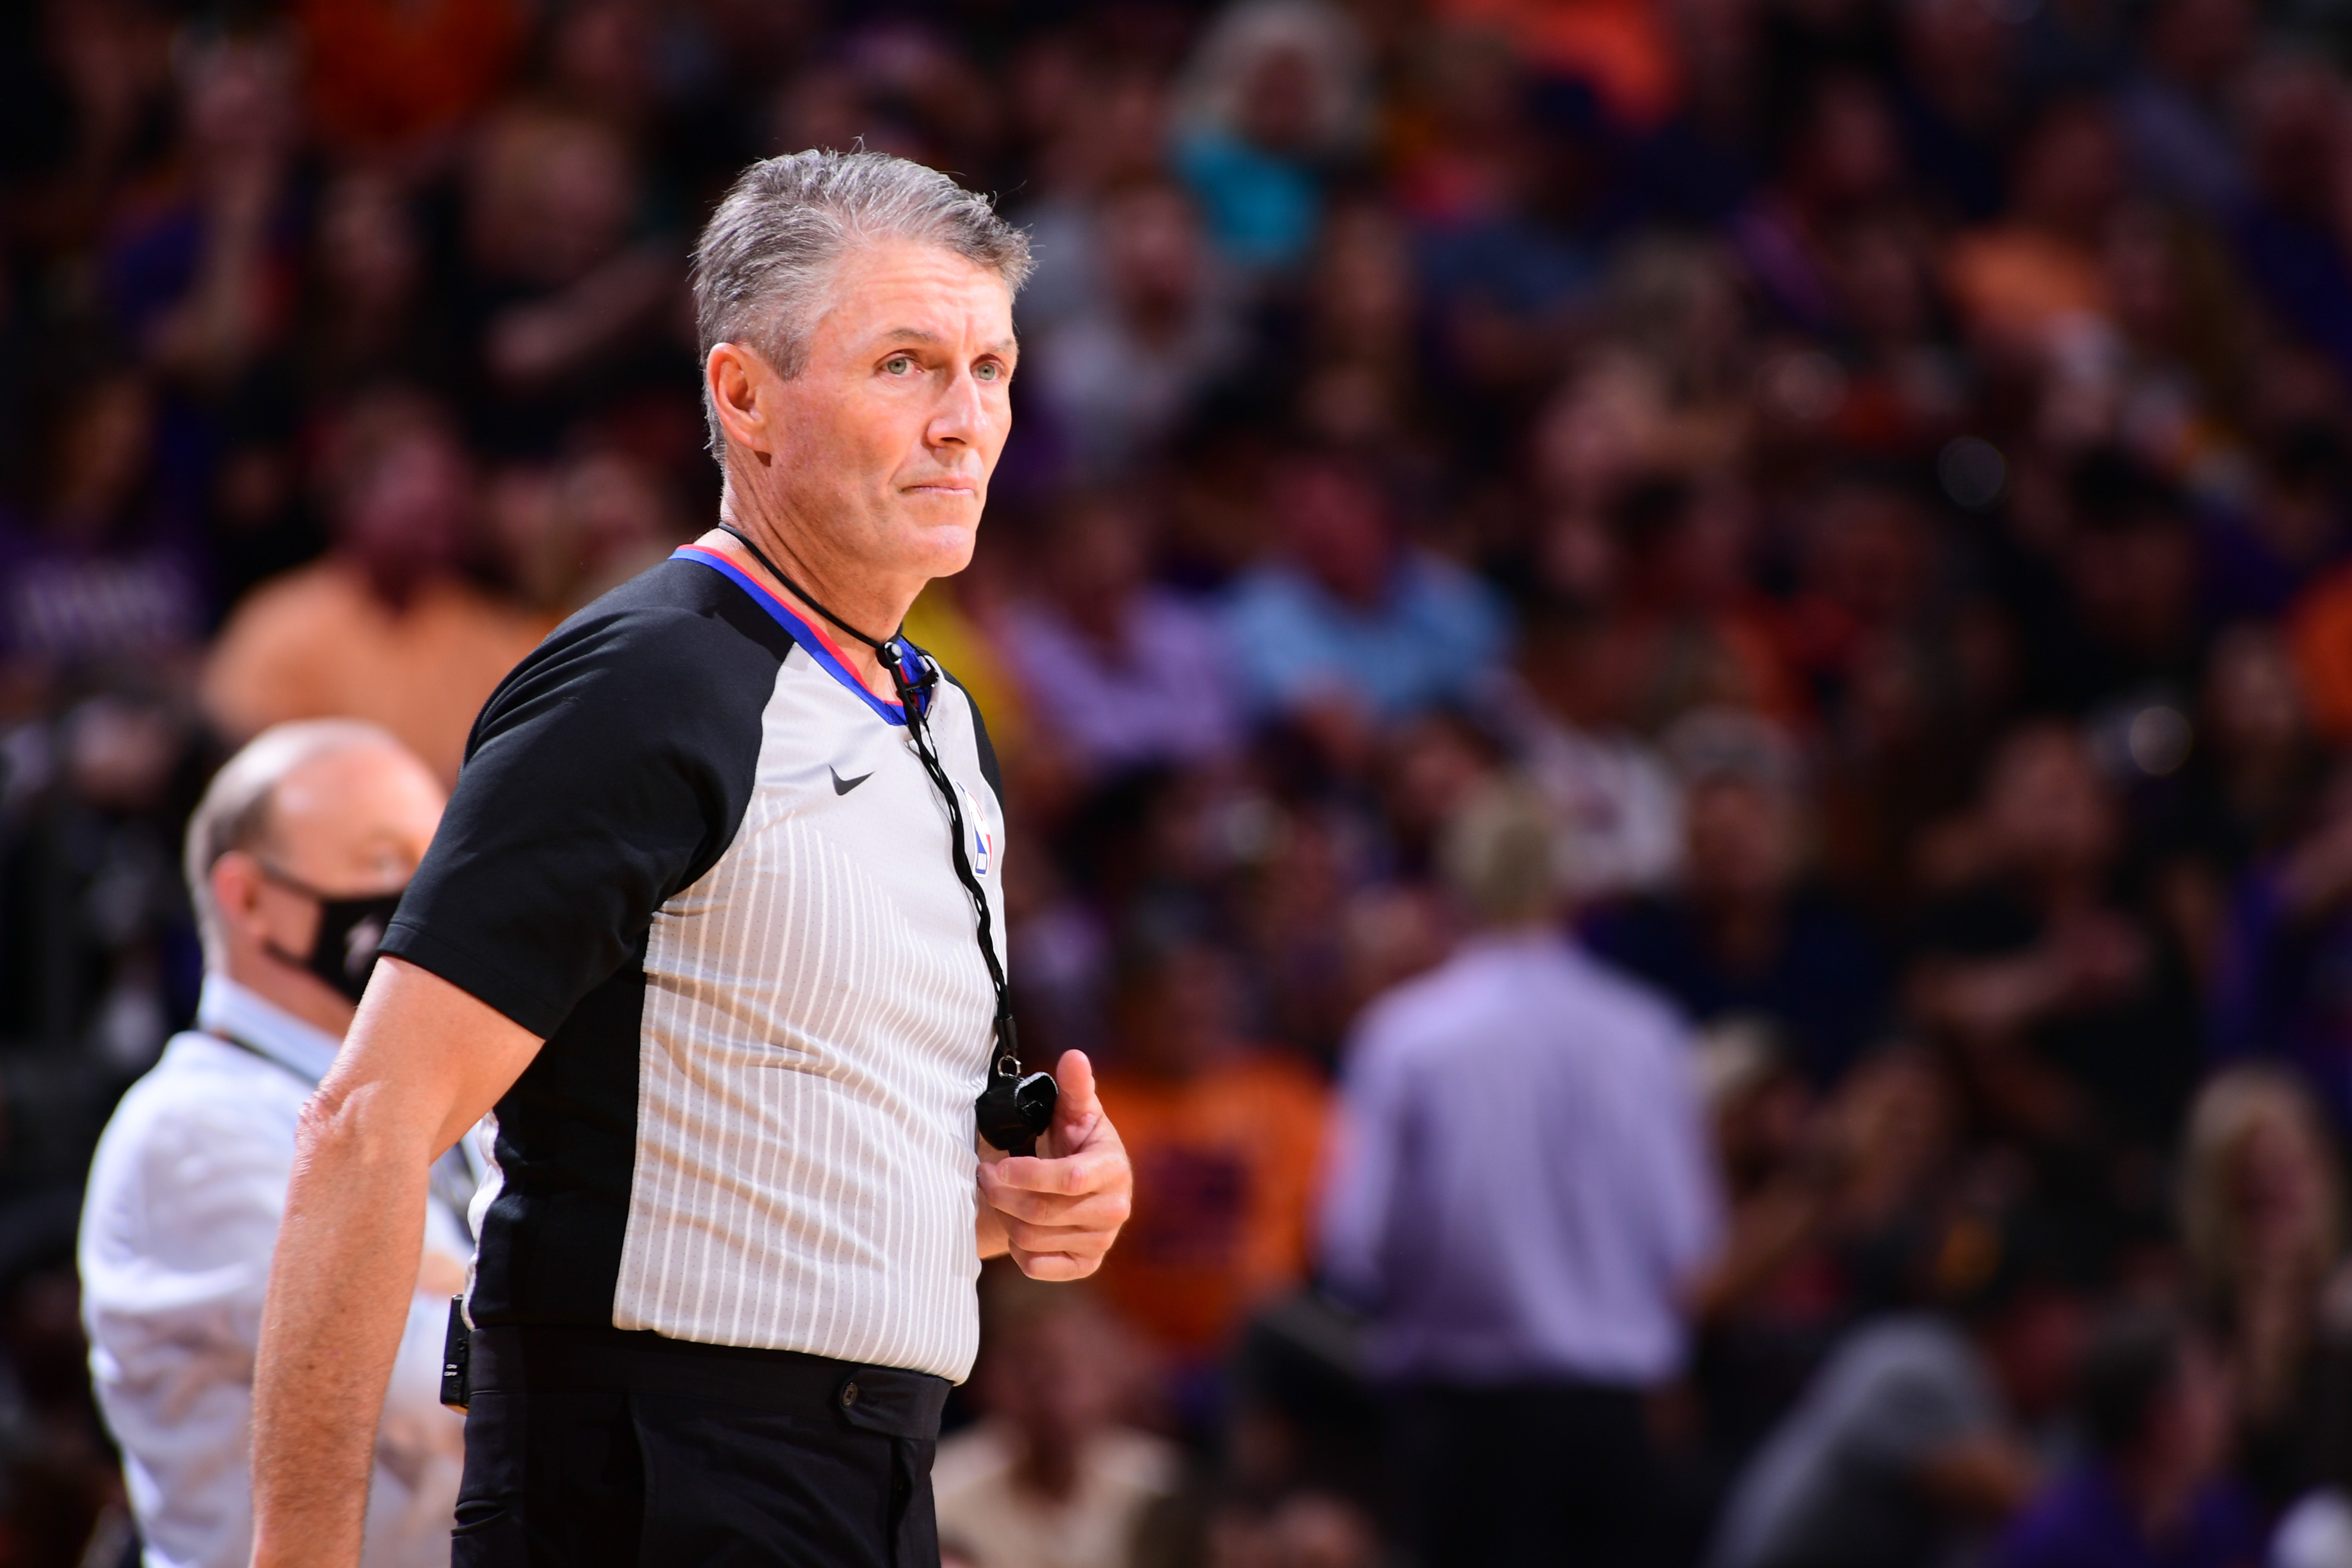 2021 NBA Finals: League Announces Referees for Bucks vs. Suns Matchup